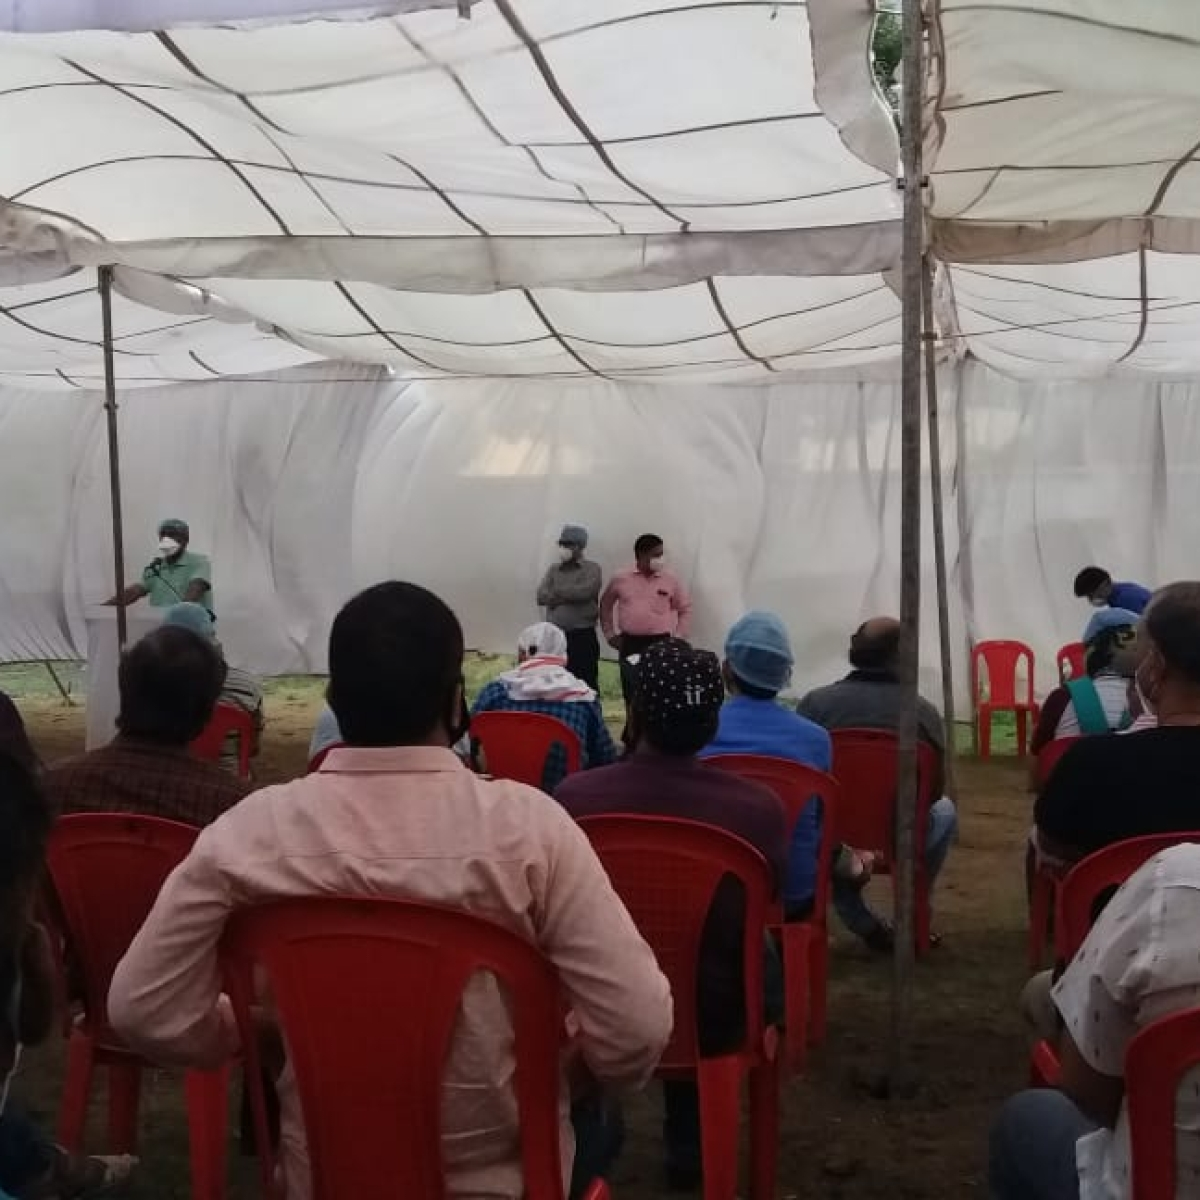 Coronavirus in Ujjain: 60% patients had contact history with healthcare workers